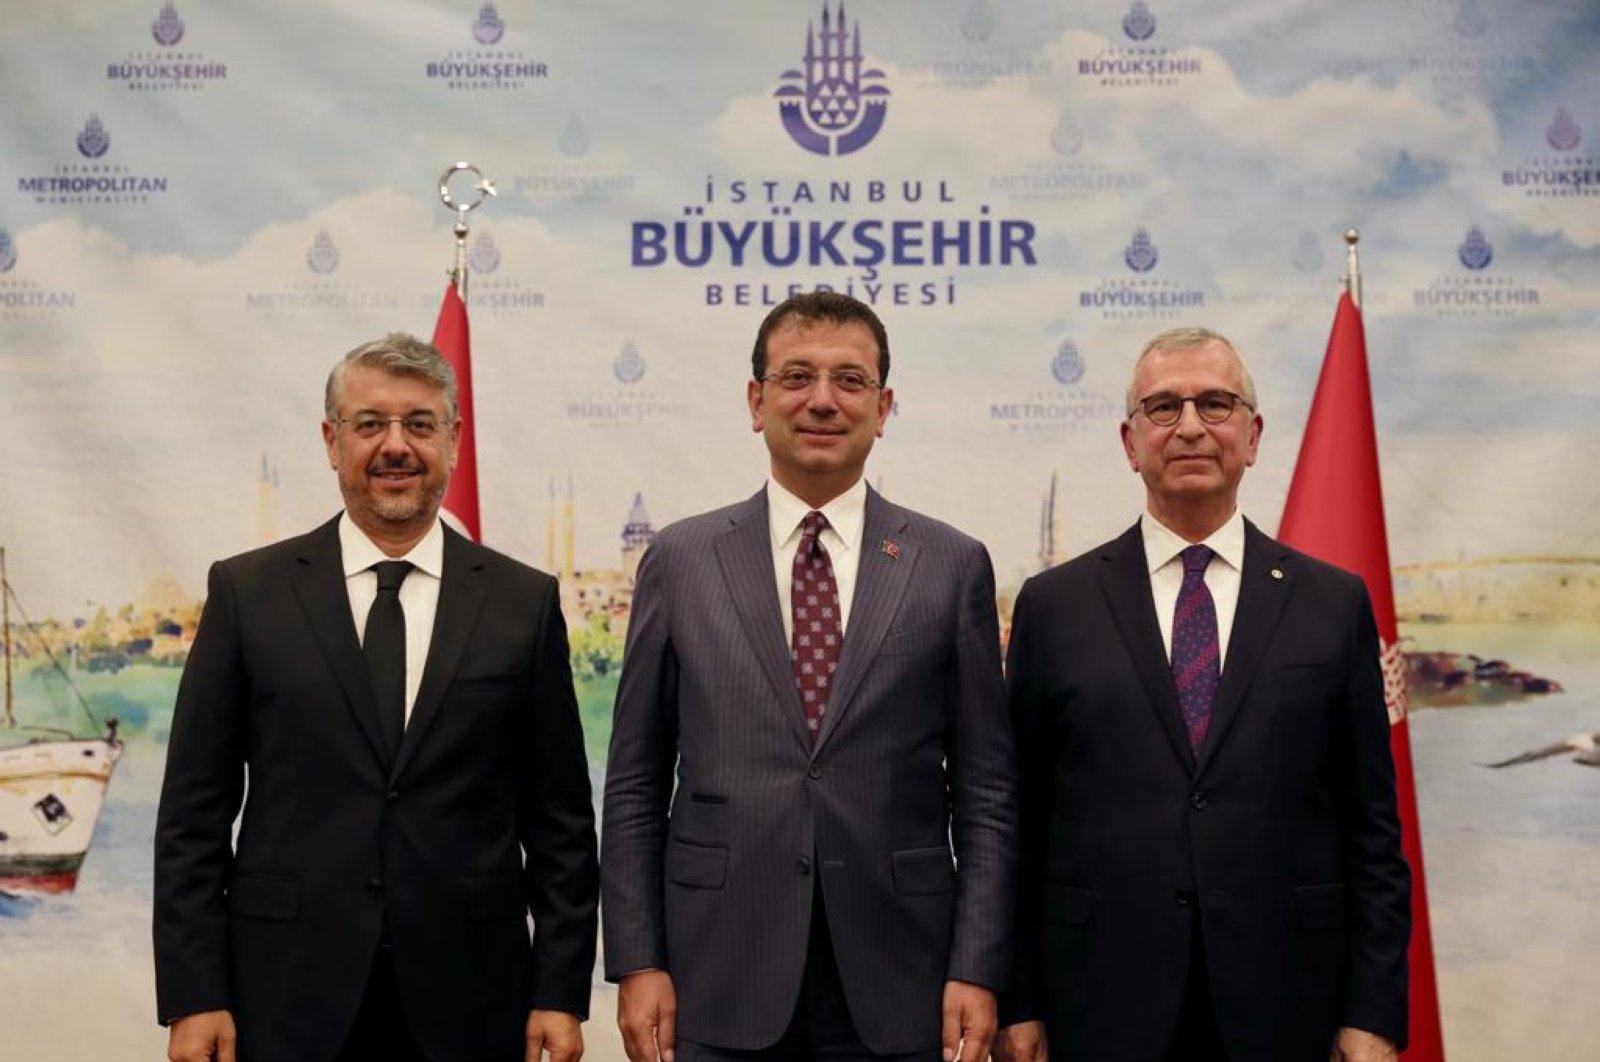 Newly appointed Istanbul Metropolitan Municipality Secretary-General Can Akın Çağlar (L) with Istanbul Mayor Ekrem Imamoğlu (C) and former Secretary-General Yavuz Erkut (R) at the handover ceremony, Istanbul, Turkey, July 8, 2020. (DHA Photo)